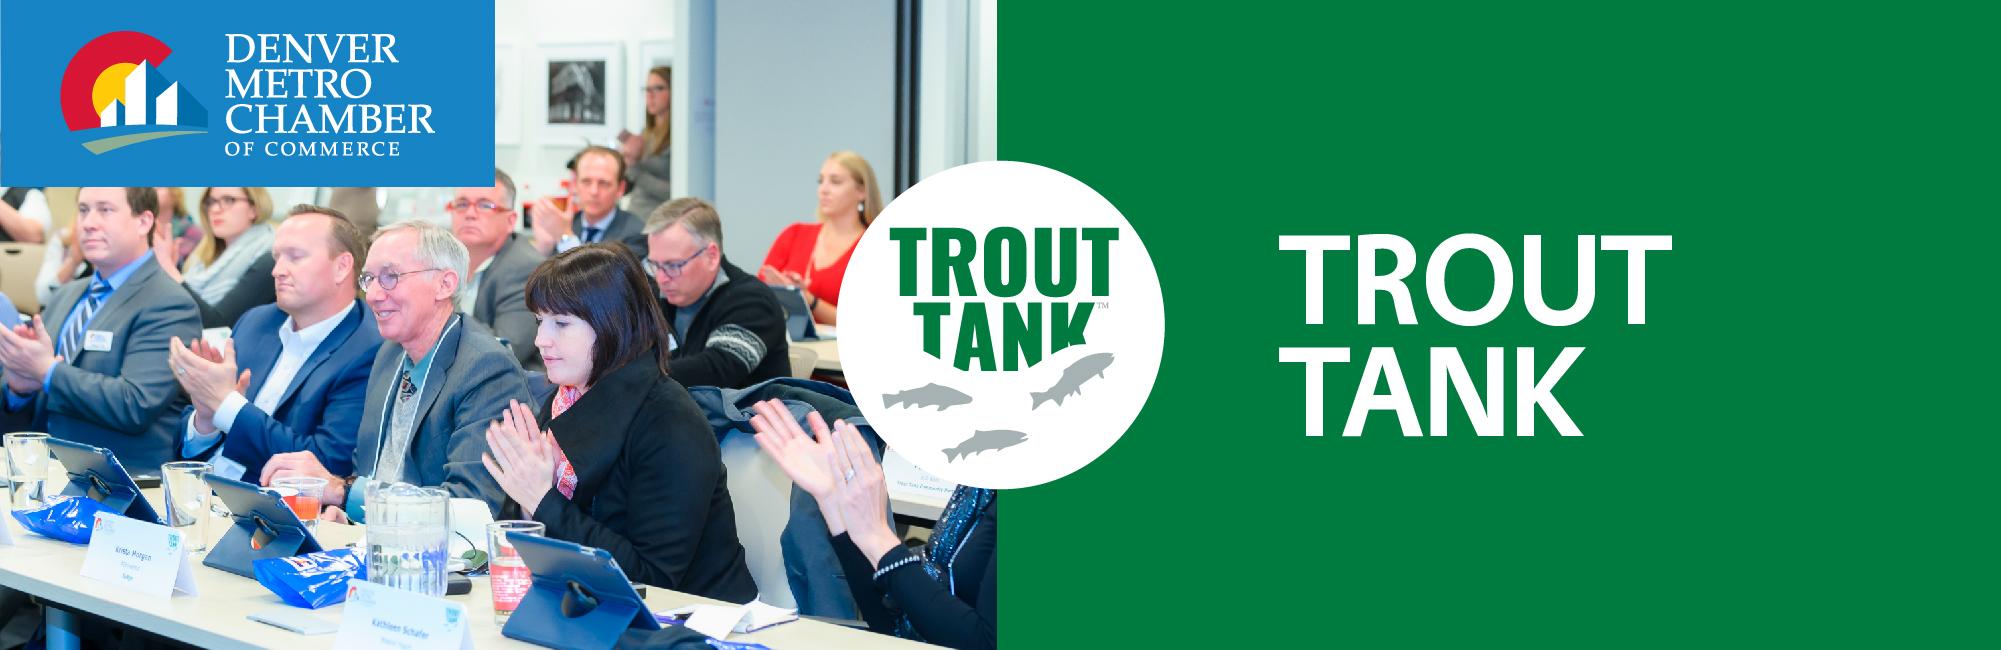 Trout Tank.jpg